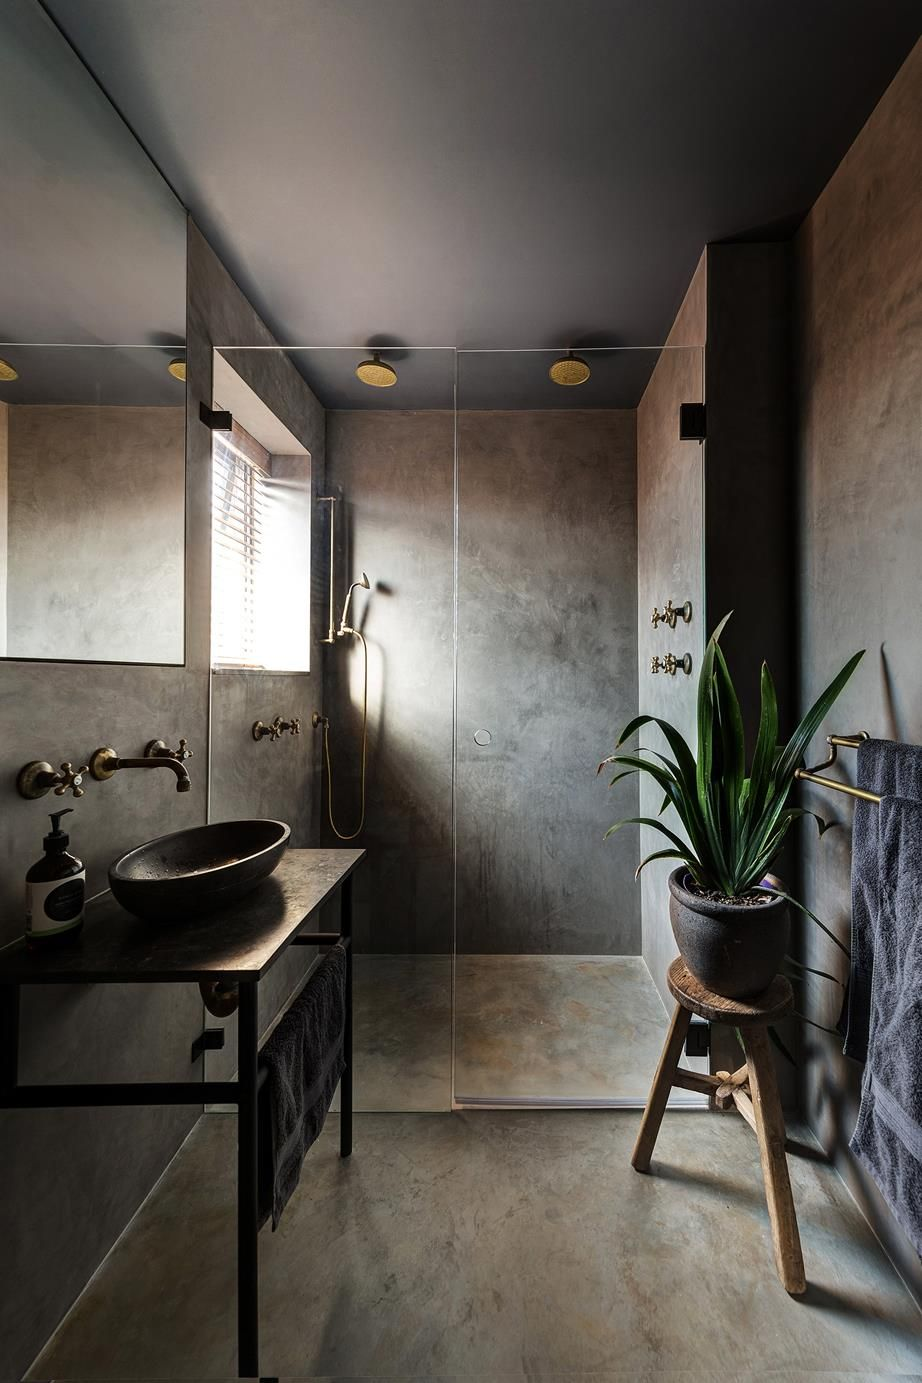 8 Luxury Bathroom Design Ideas To Inspire